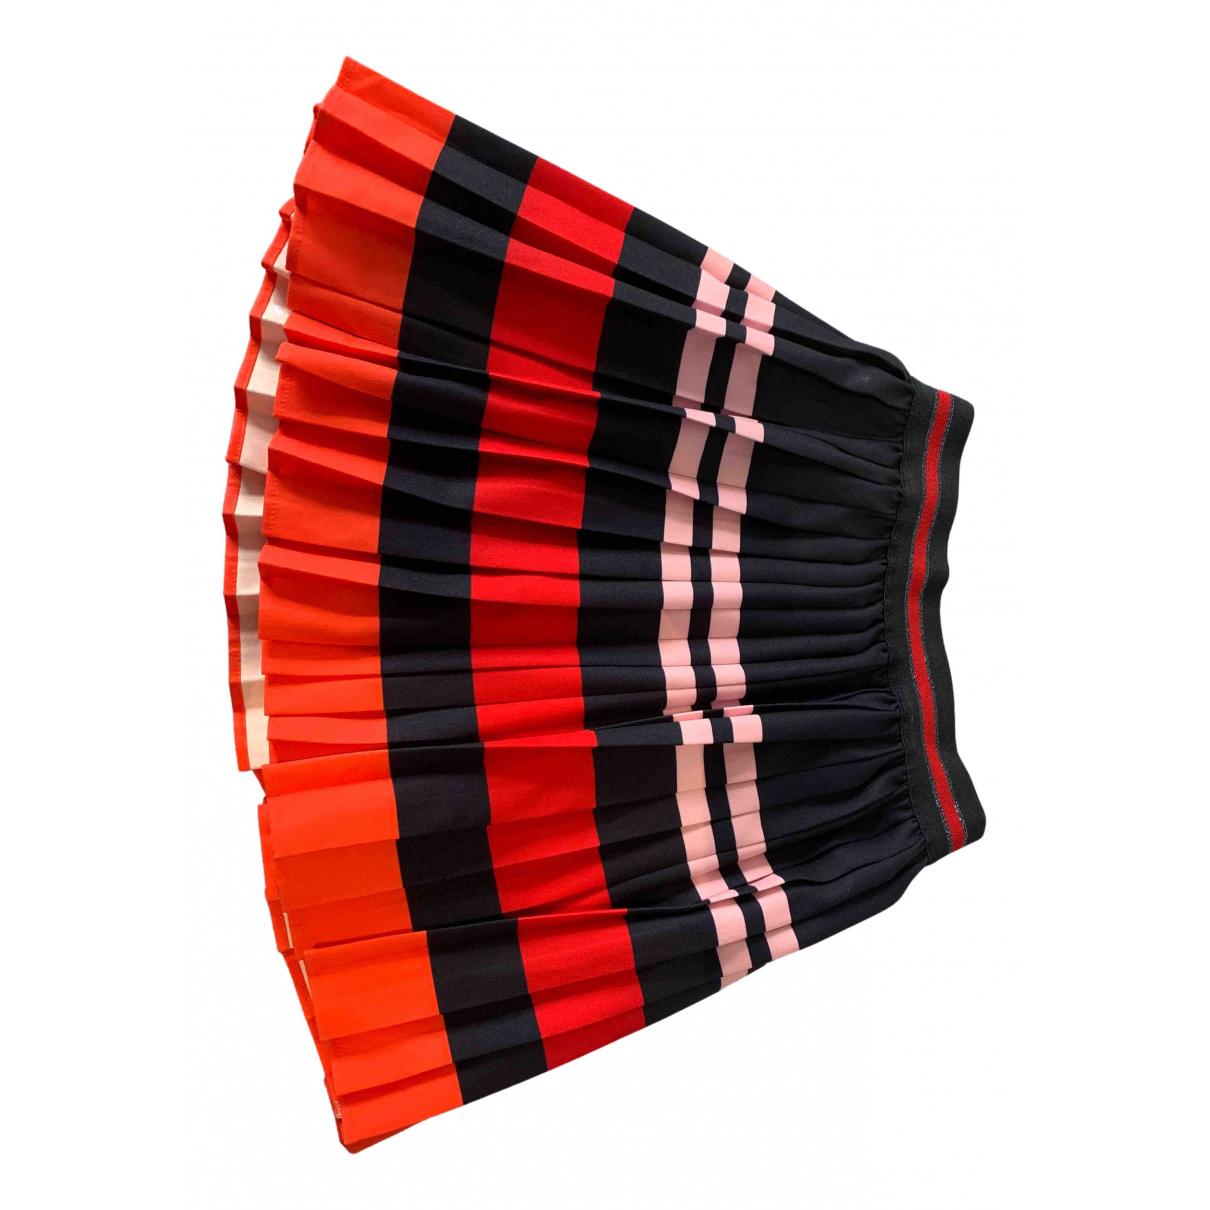 Jacadi N Blue skirt for Kids 6 years - up to 114cm FR